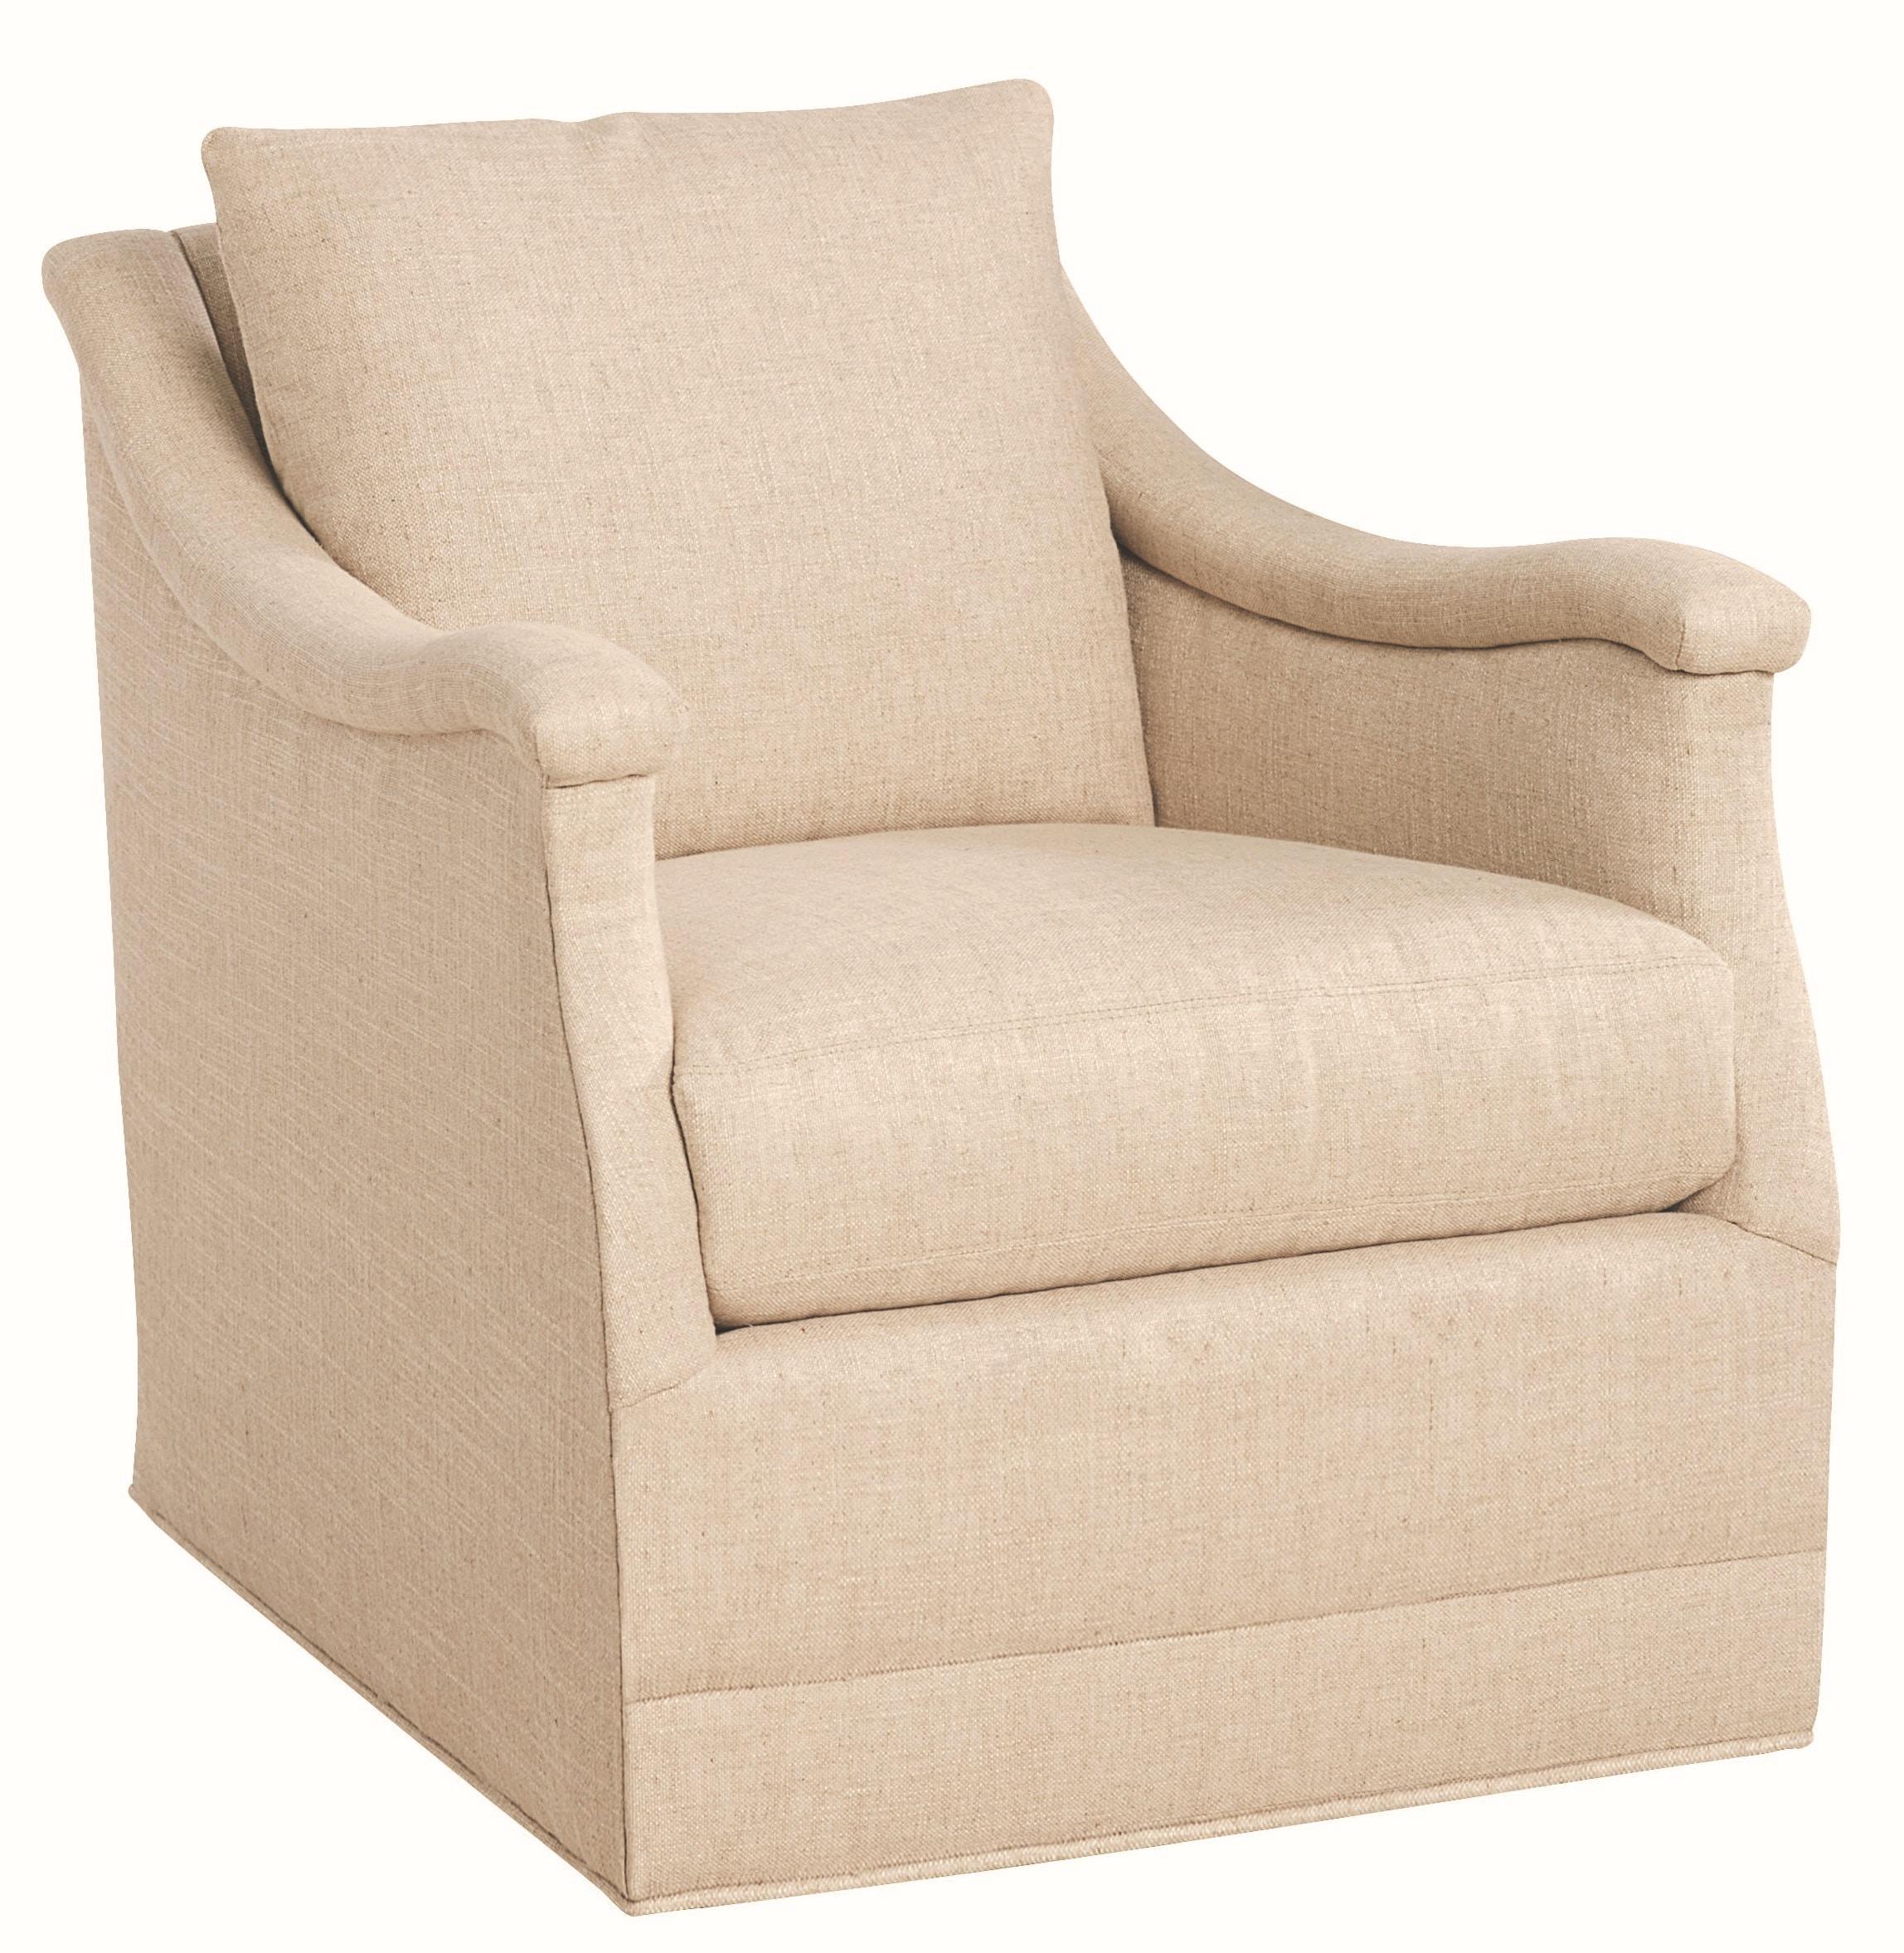 Lee Industries Swivel Chair 3703 01SW